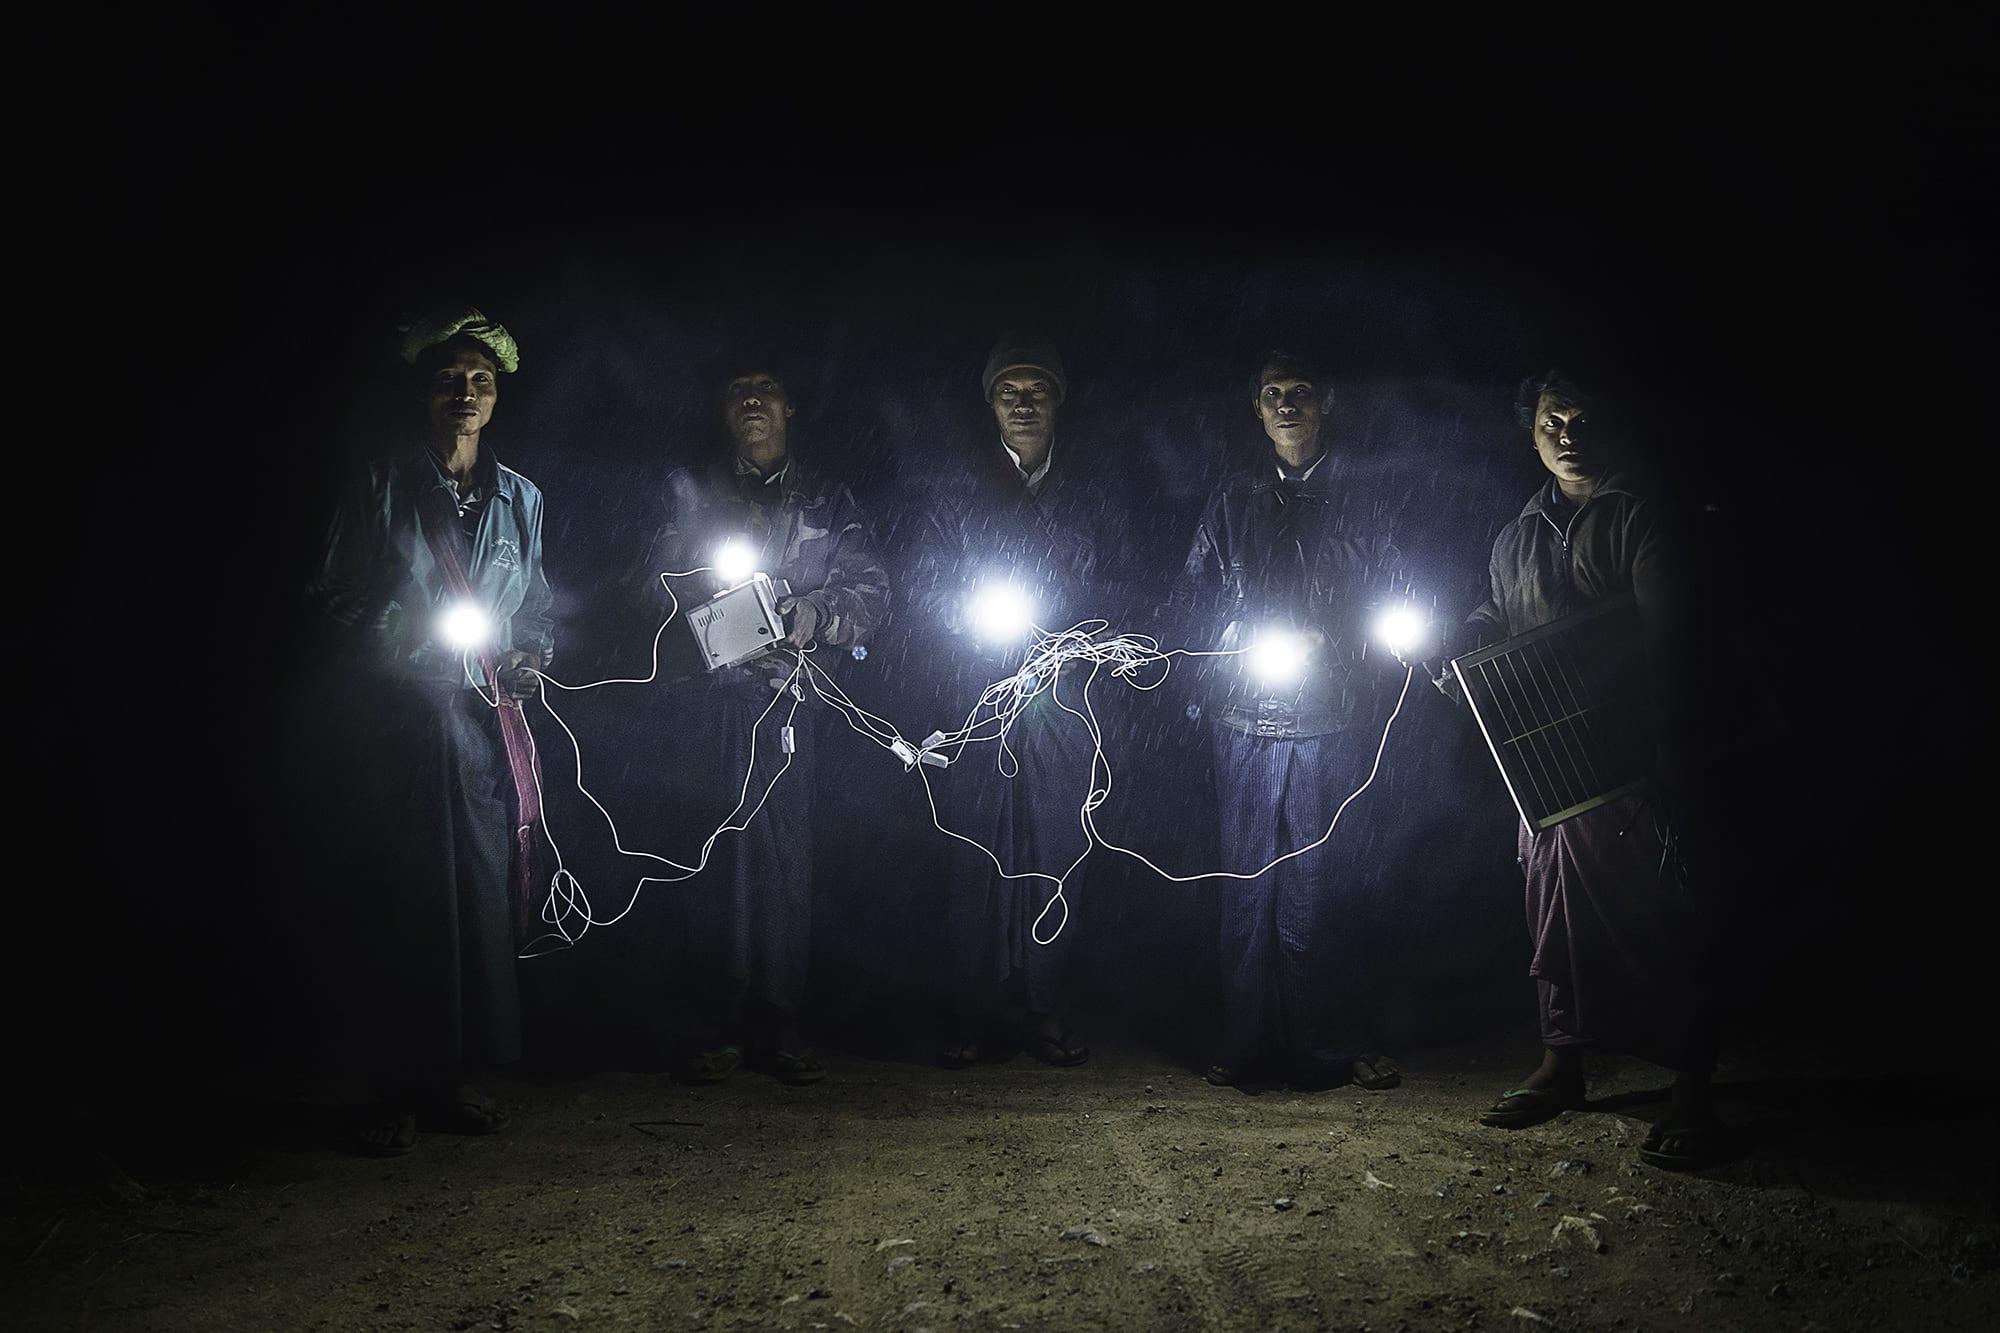 Village leaders walk through Inn Gaung Village illuminated by a solar panel energy system.